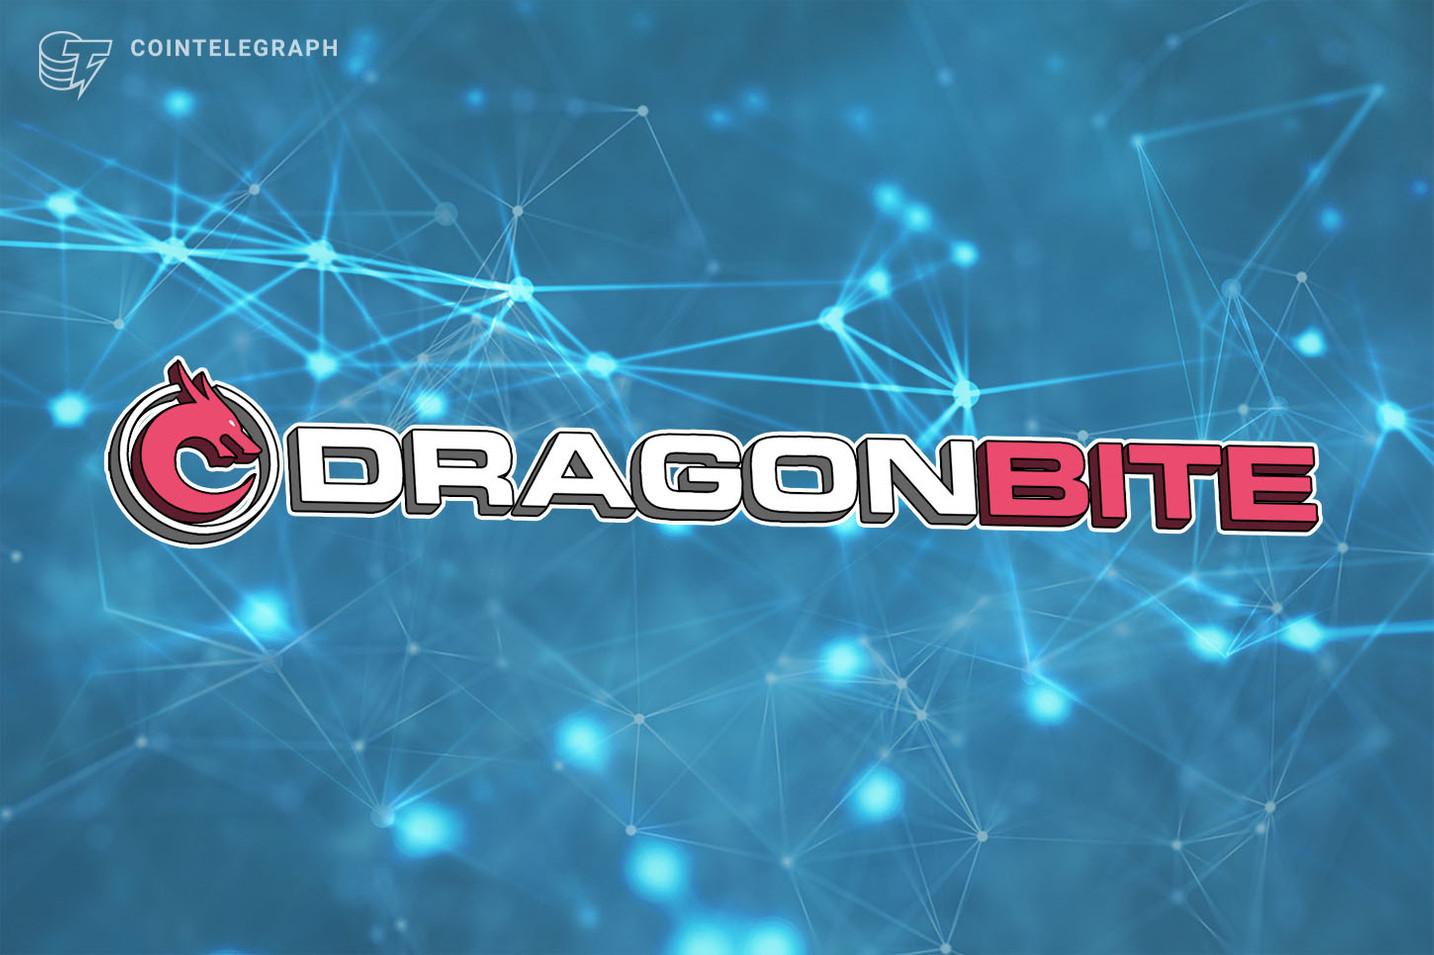 DragonBite raises over $2.7 million within 48 hours